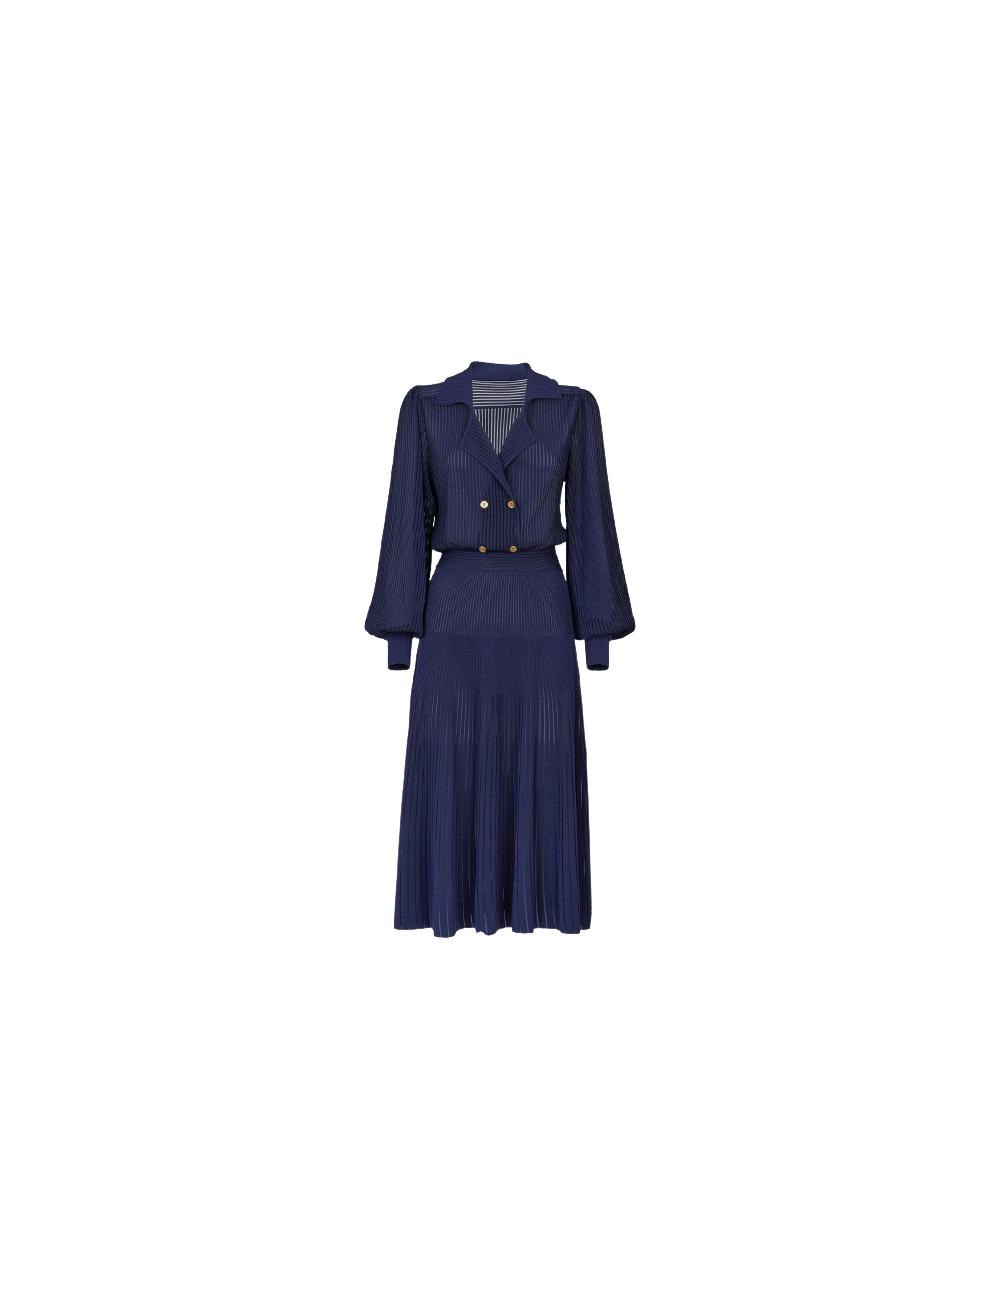 Shirt shaped dress Fendi - BIG BOSS MEGEVE